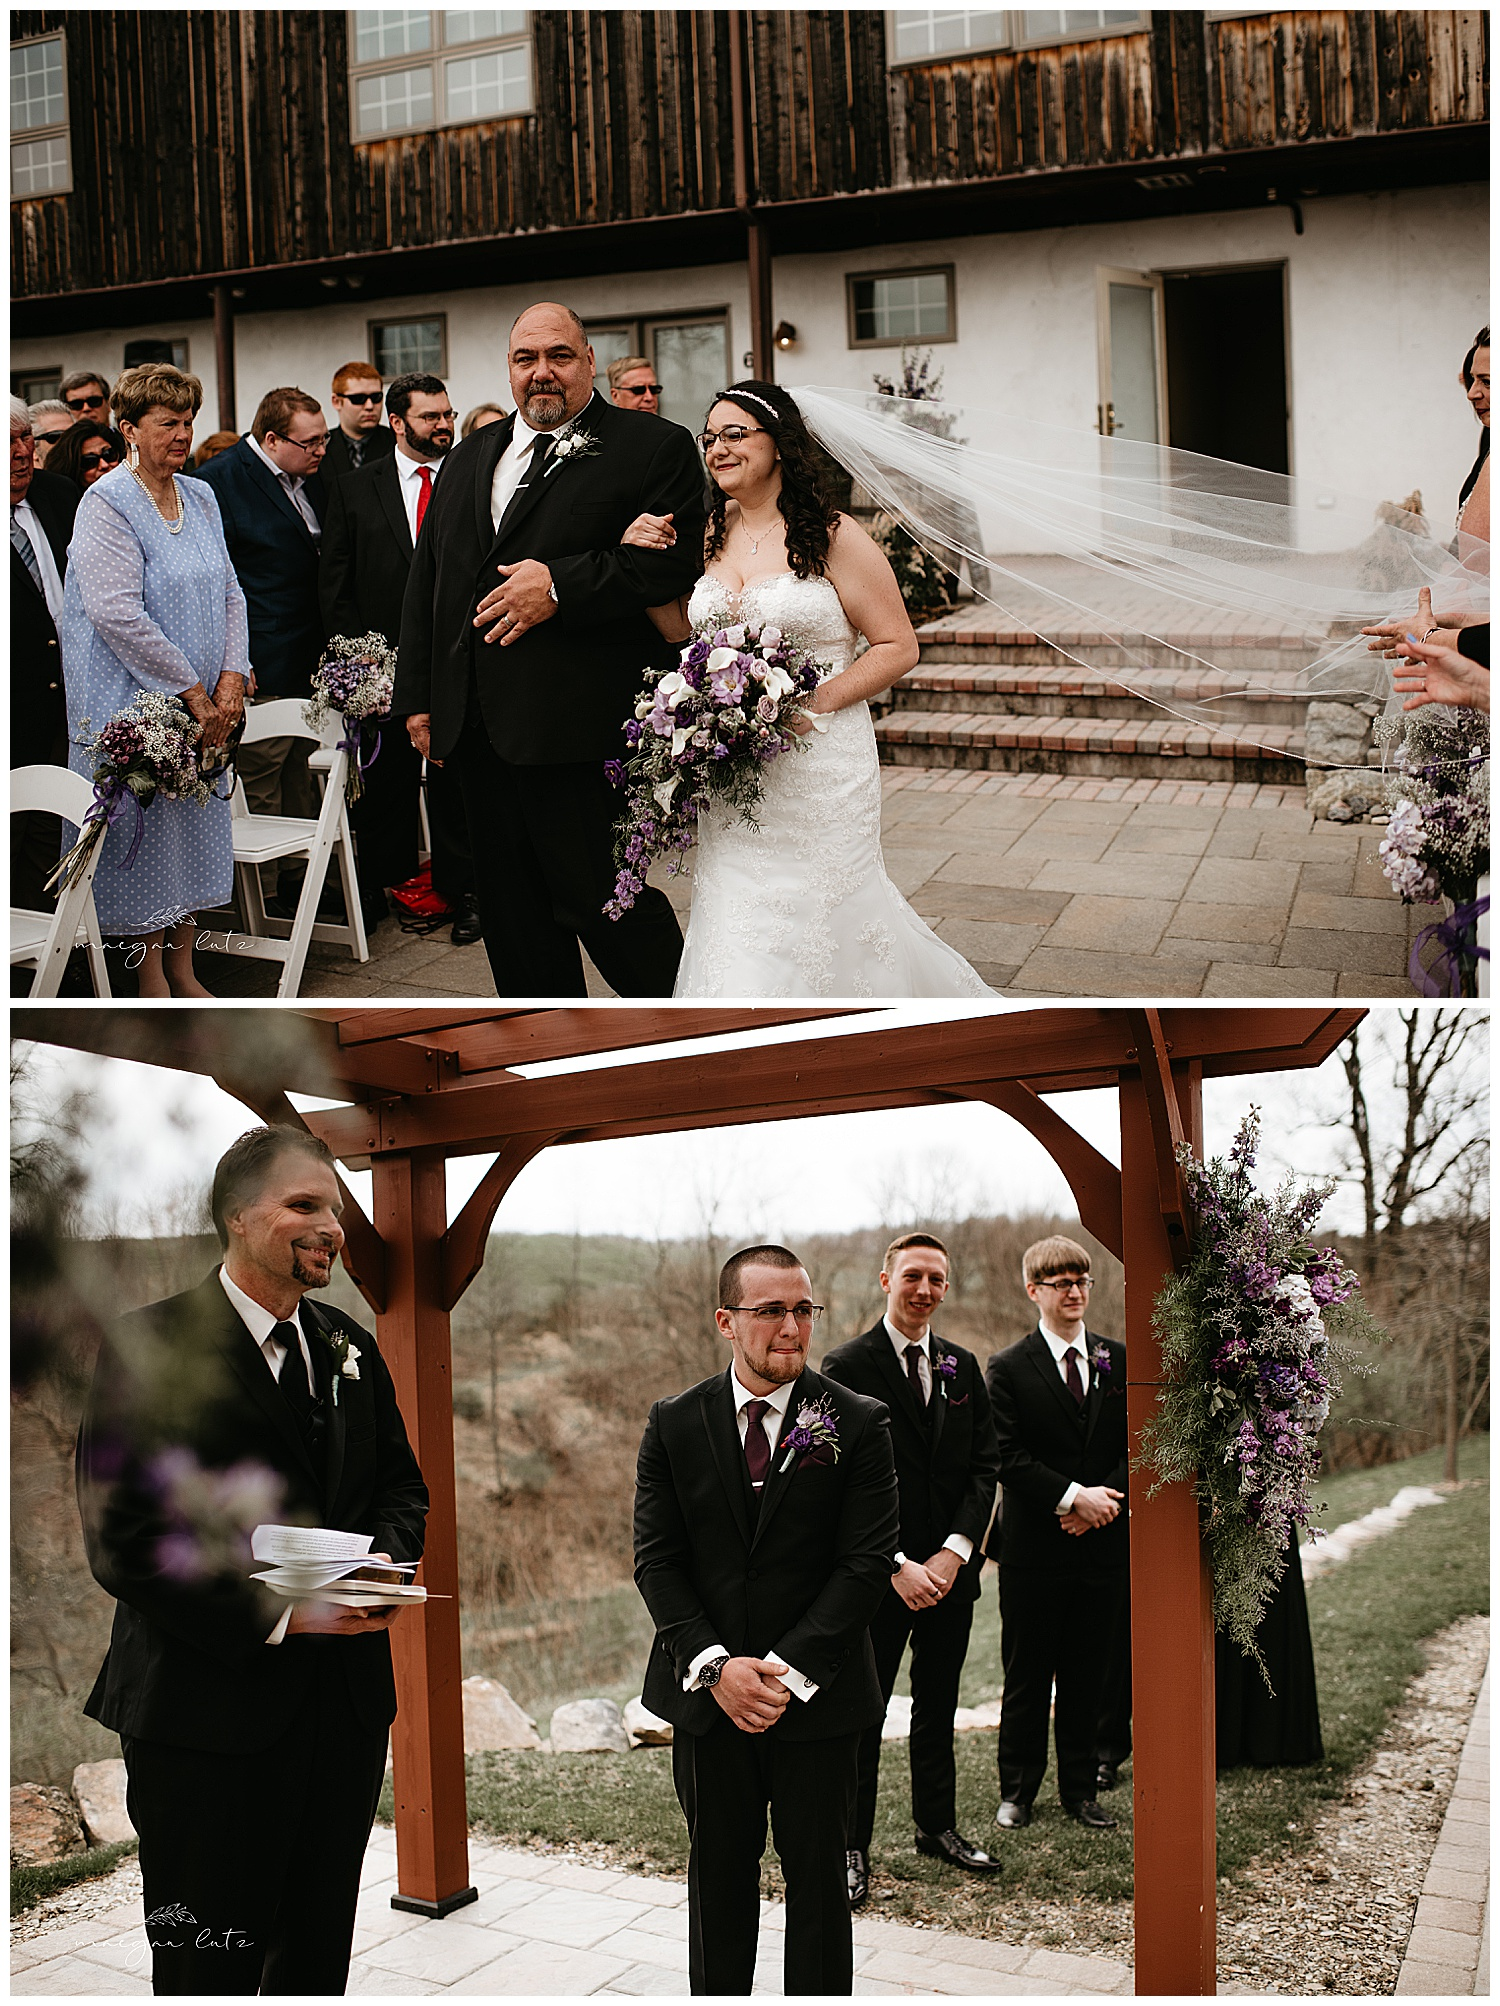 NEPA-wedding-photographer-at-the-glasbern-inn-fogelsvilles-pa_0013.jpg